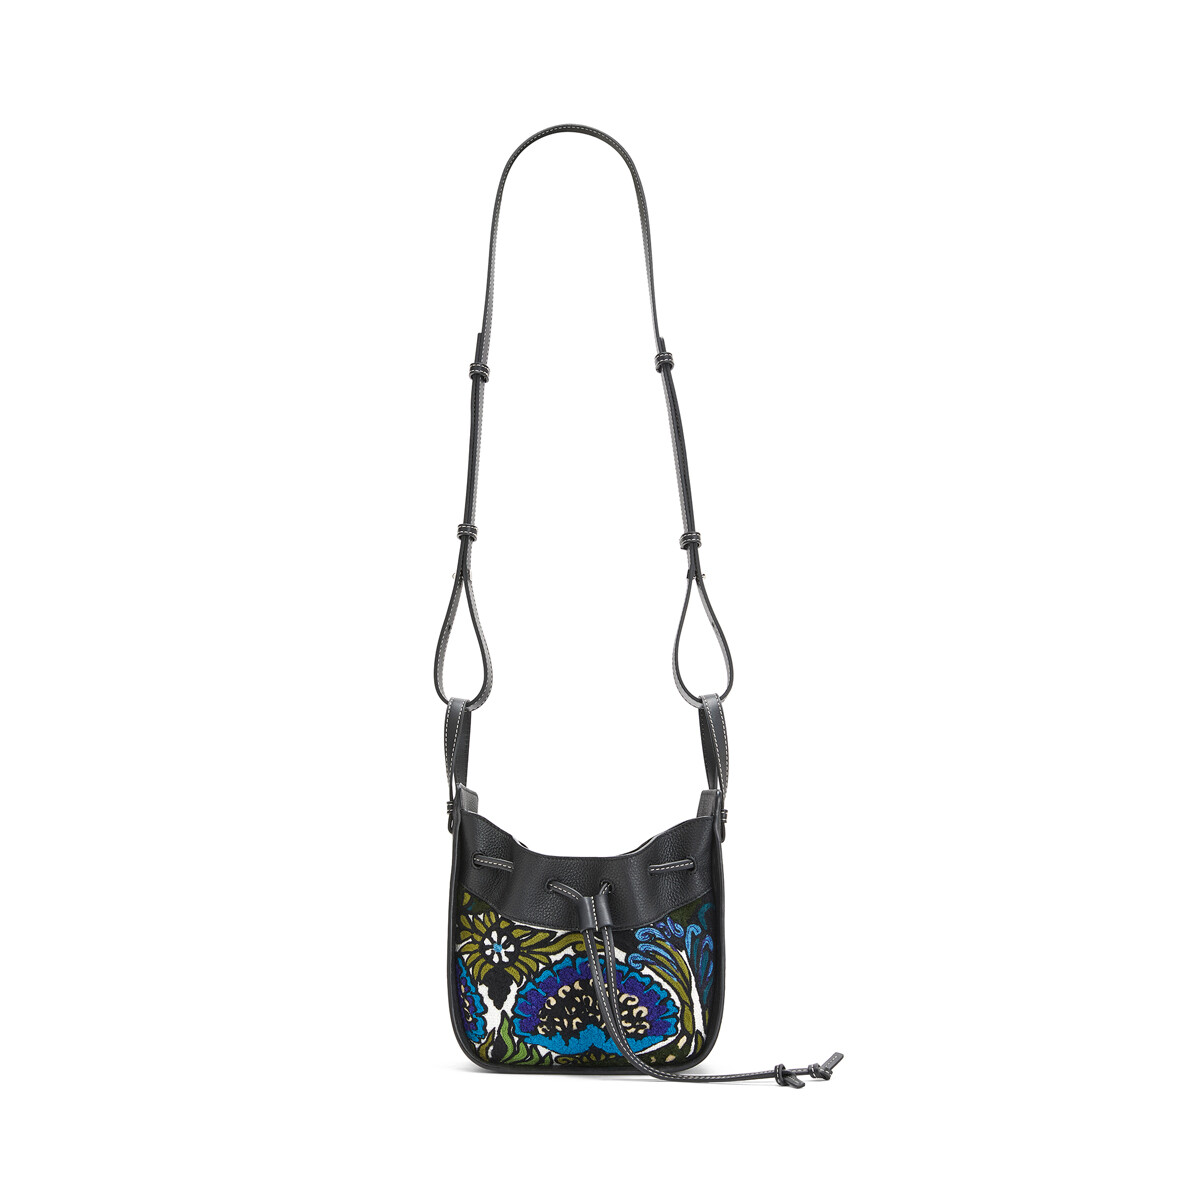 LOEWE Hammock Drawstring Floral Mini Bag Peacock Blue front